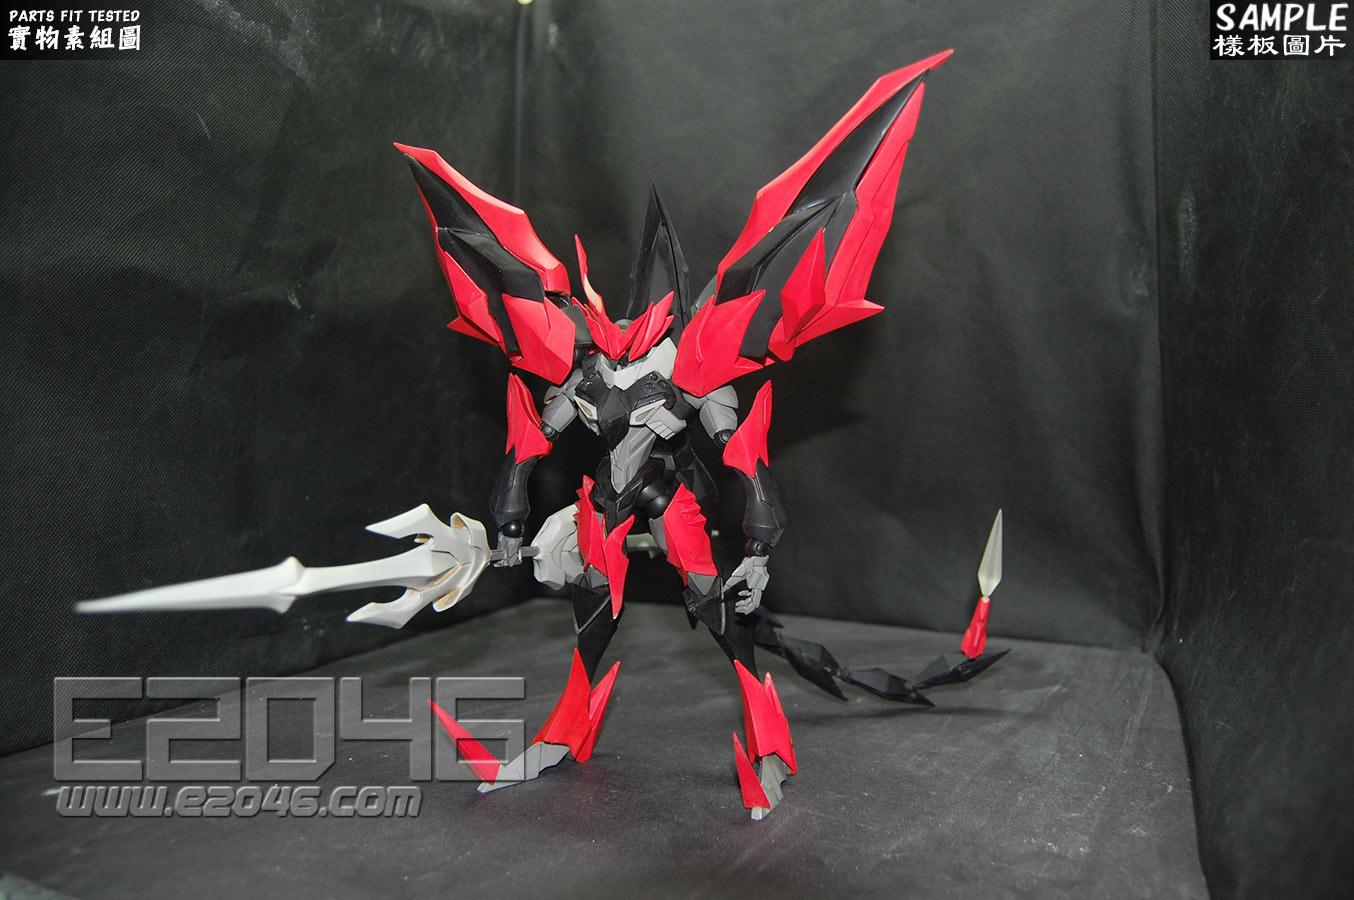 Blaster Ebiru